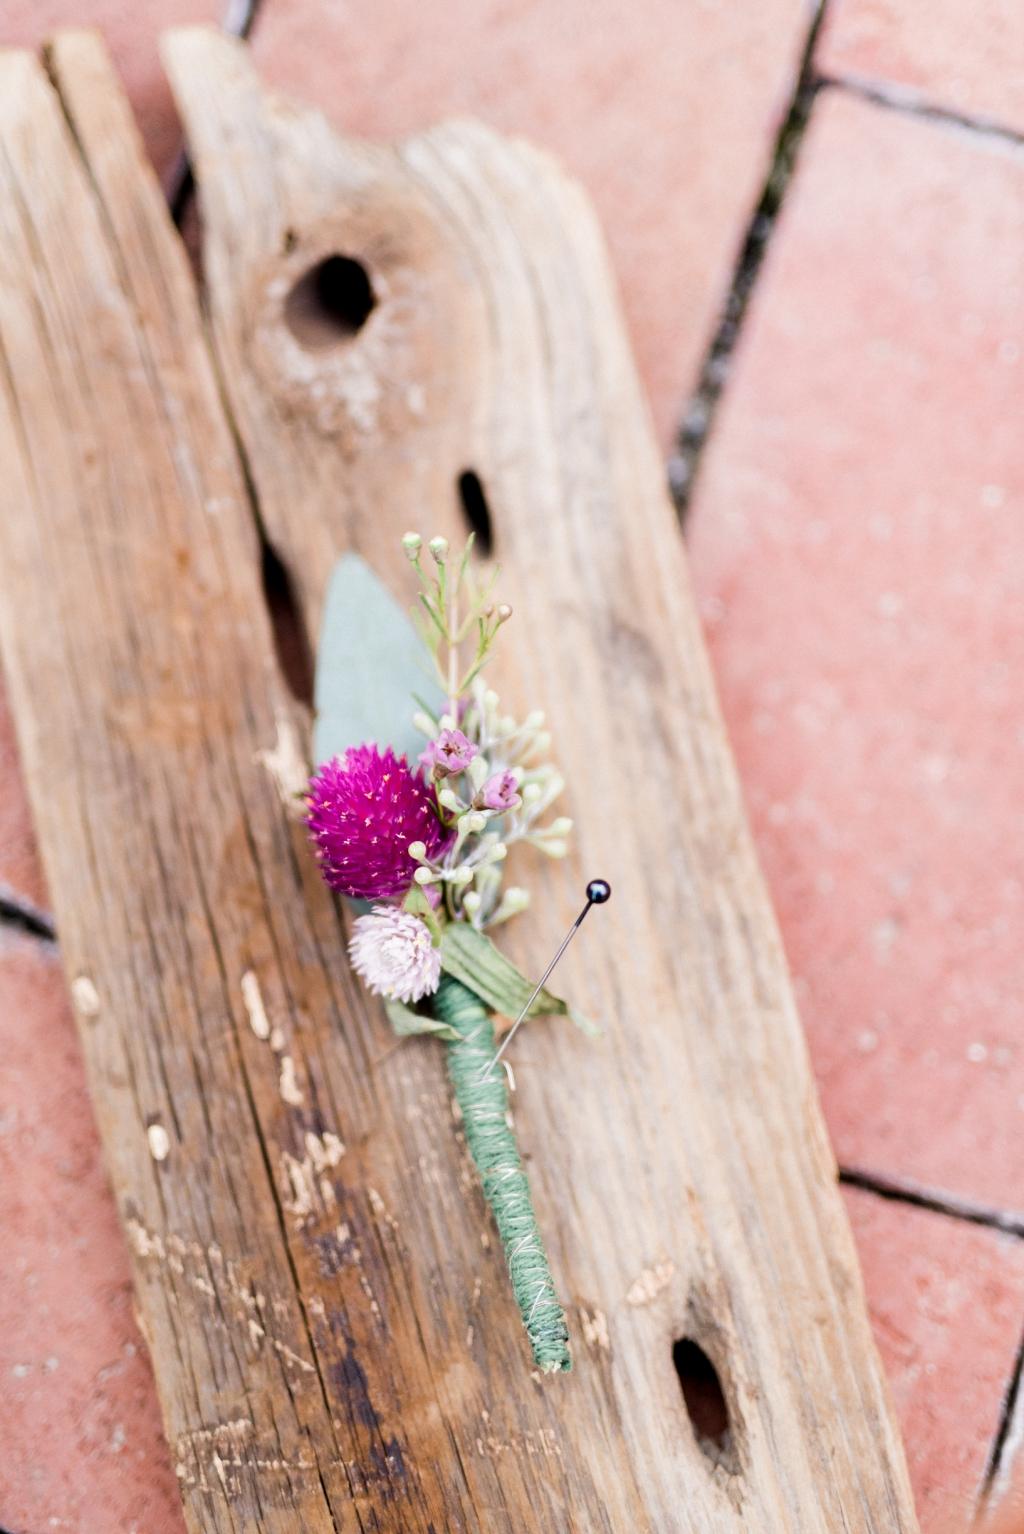 haley-richter-photography-buena-vista-confrence-center-wedding-summer-113